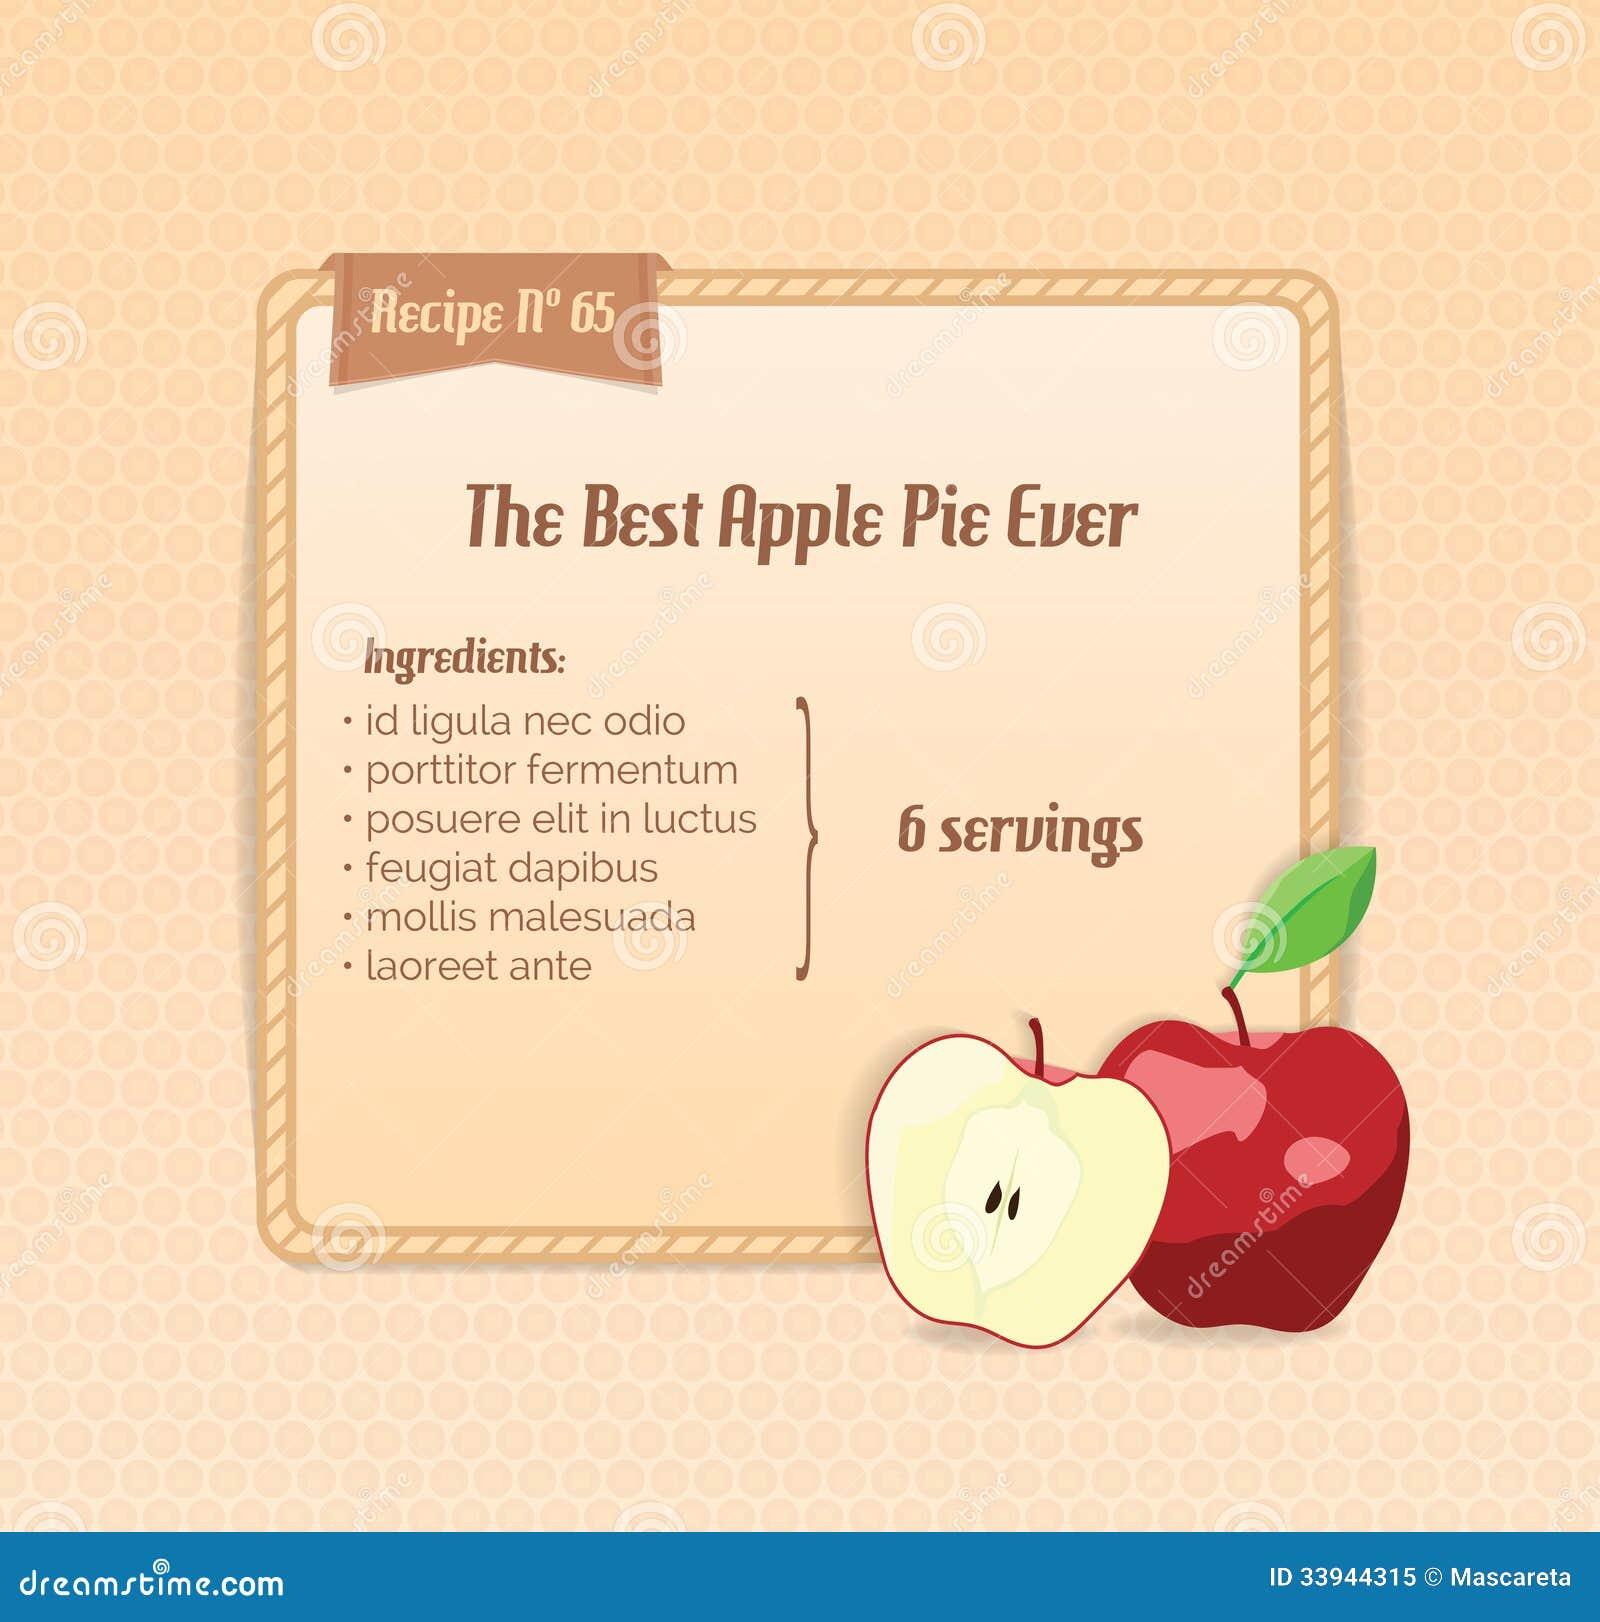 Bright Recipe Card With Cute Cartoon Apple. Royalty Free